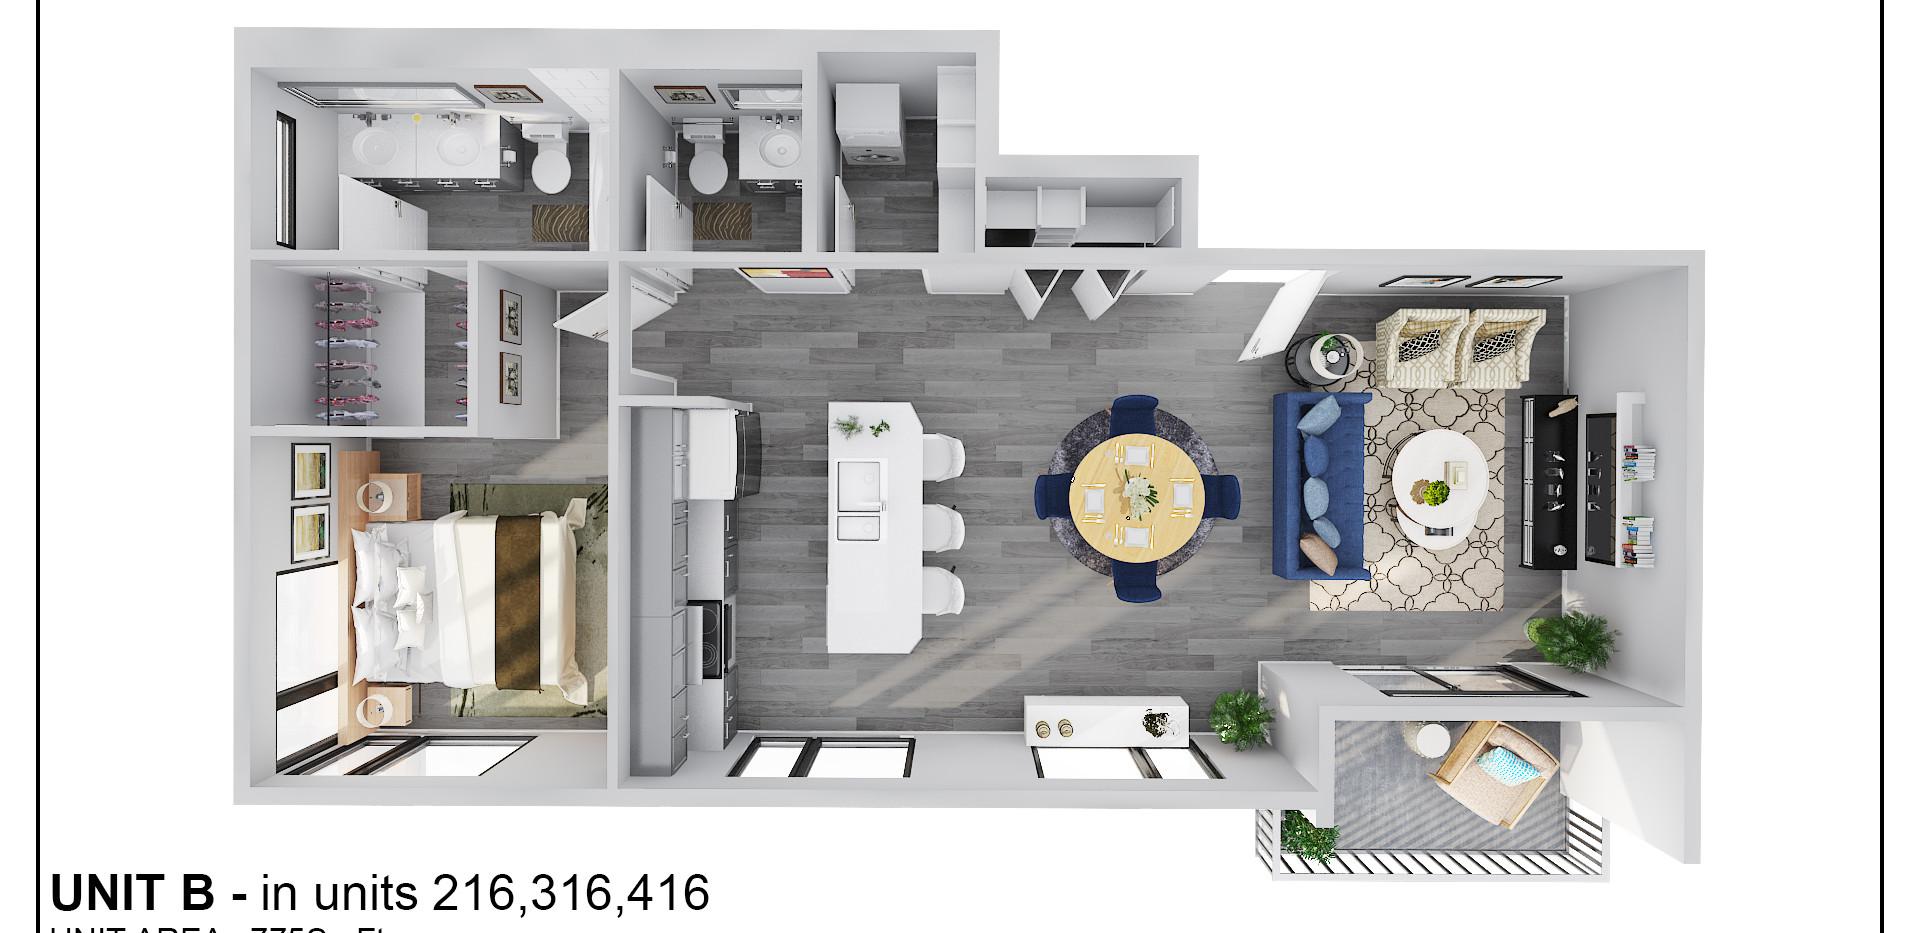 Floor Two - Unit B - 216